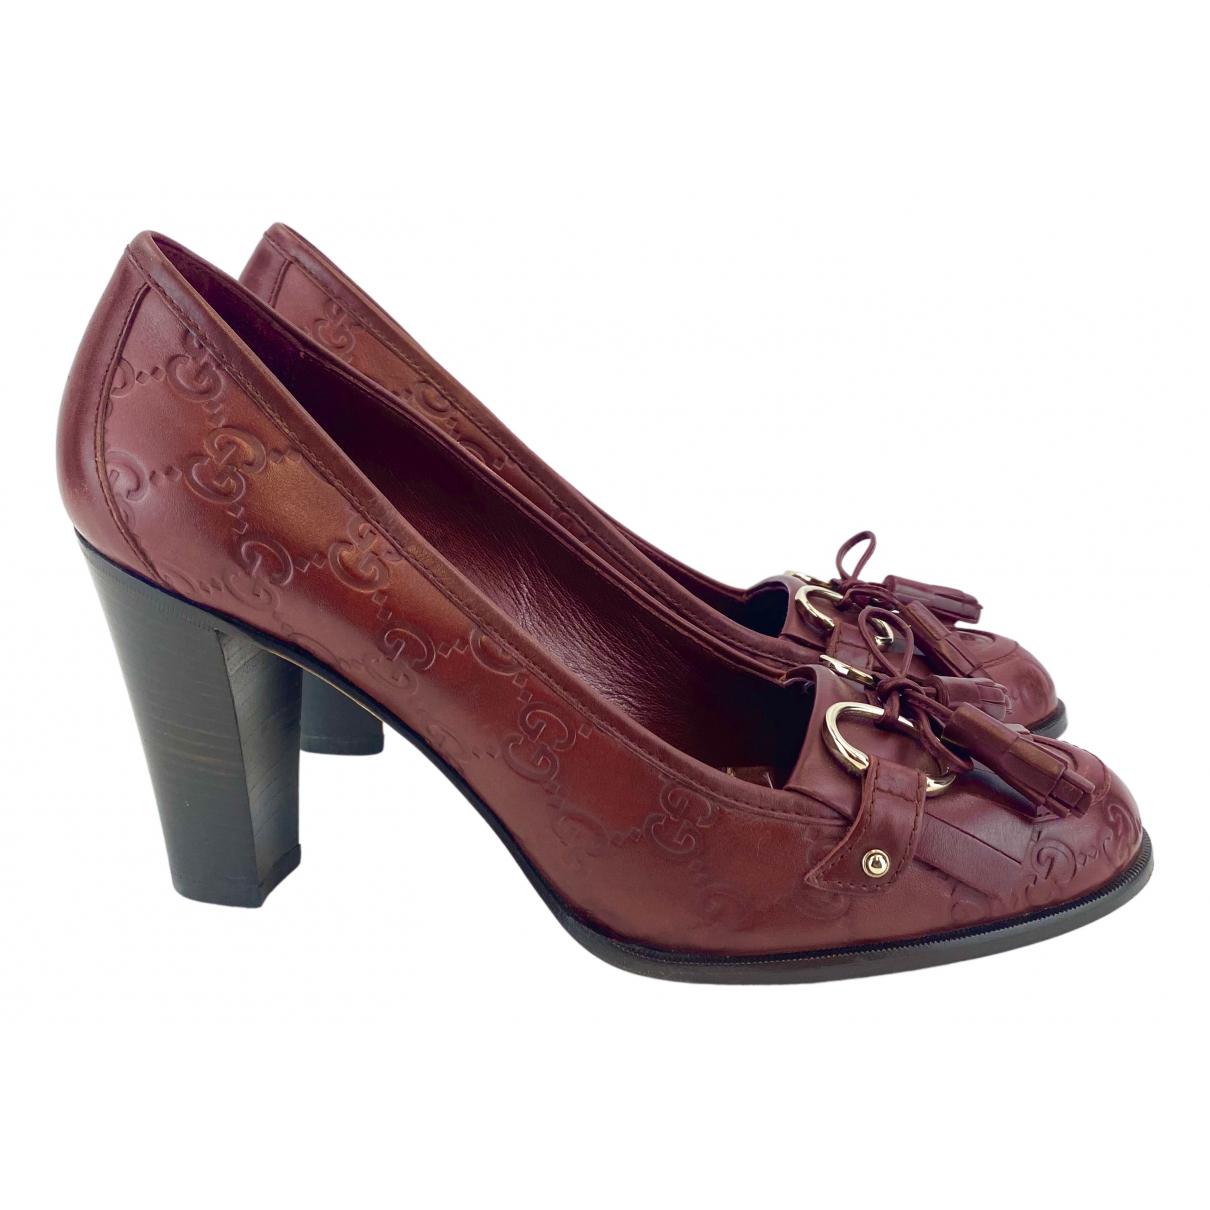 Gucci N Burgundy Leather Heels for Women 40 EU